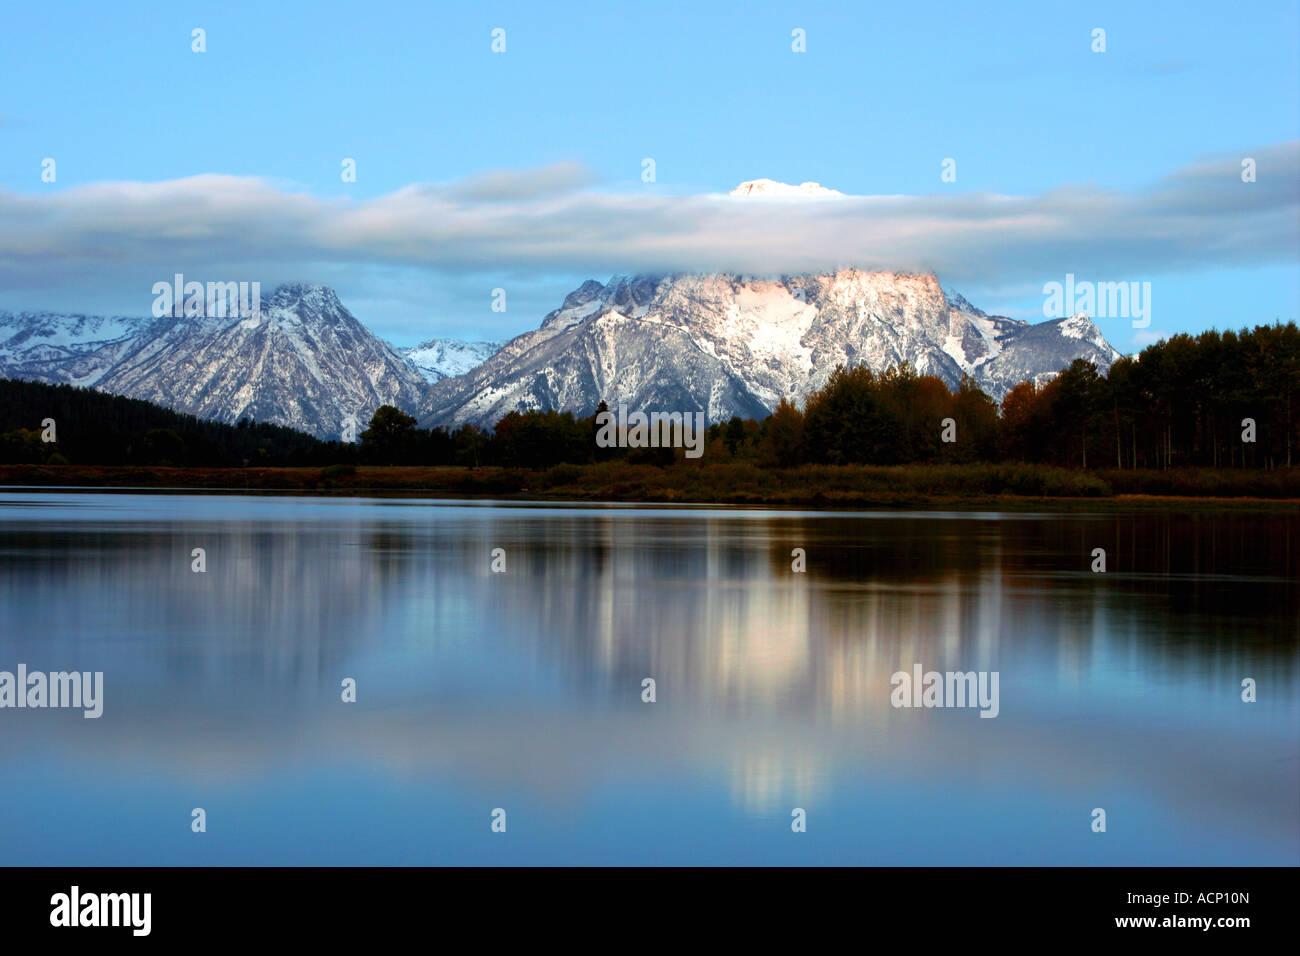 Mount Moran, Grand-Teton-Nationalpark, wyoming Stockfoto